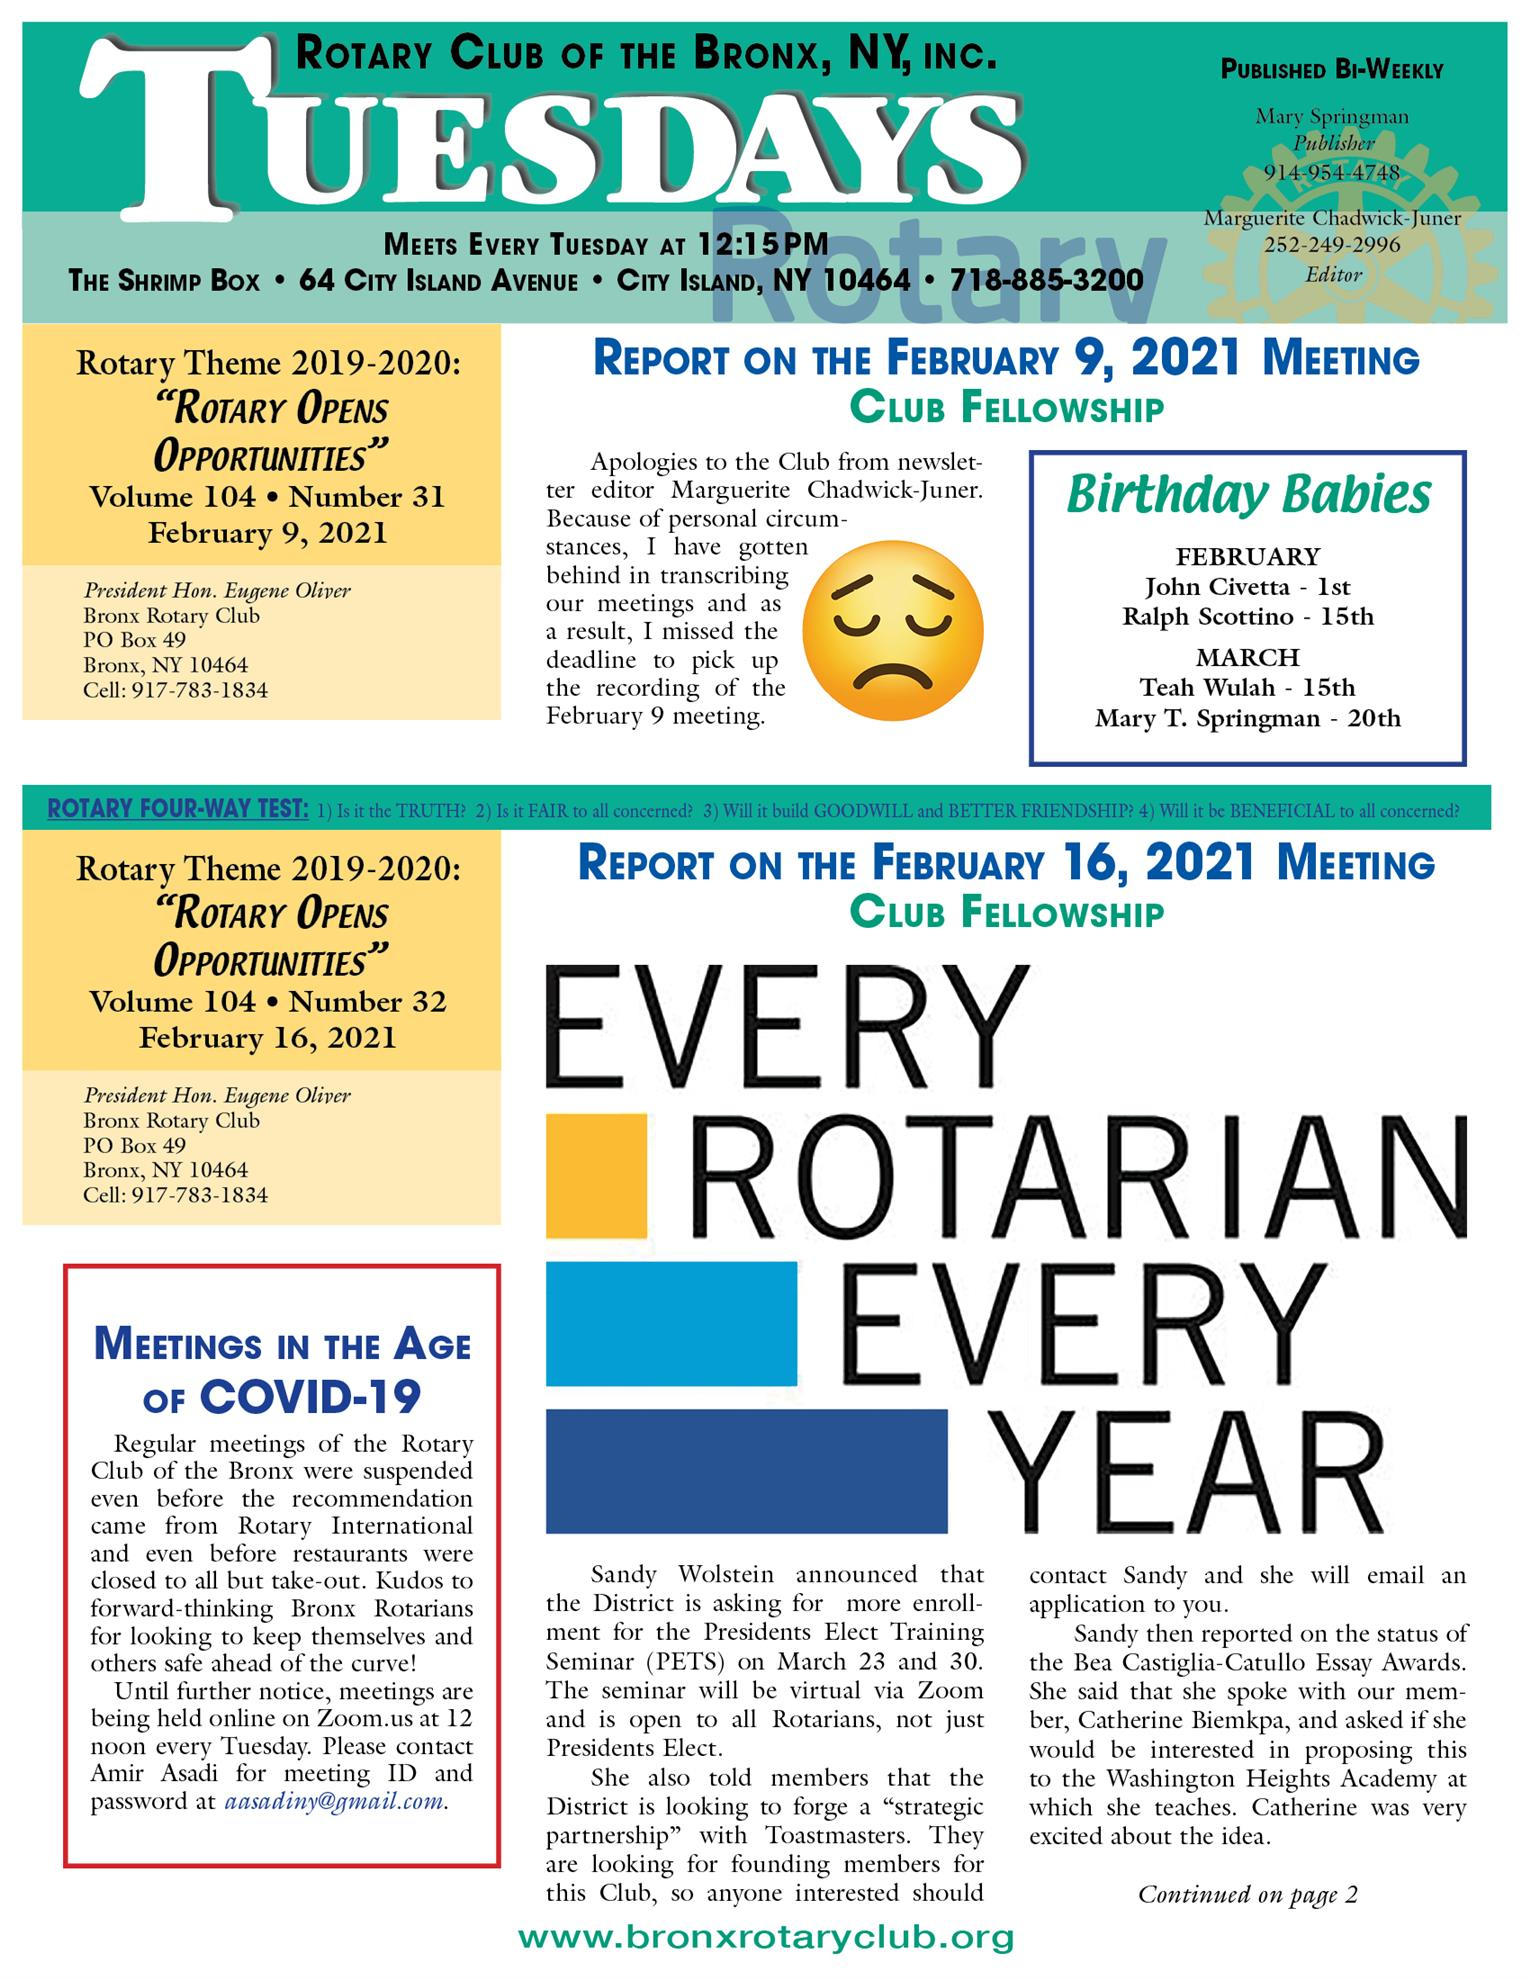 Tuesdays newsletter 2/9, 2/26 & 2/23/2021 p1